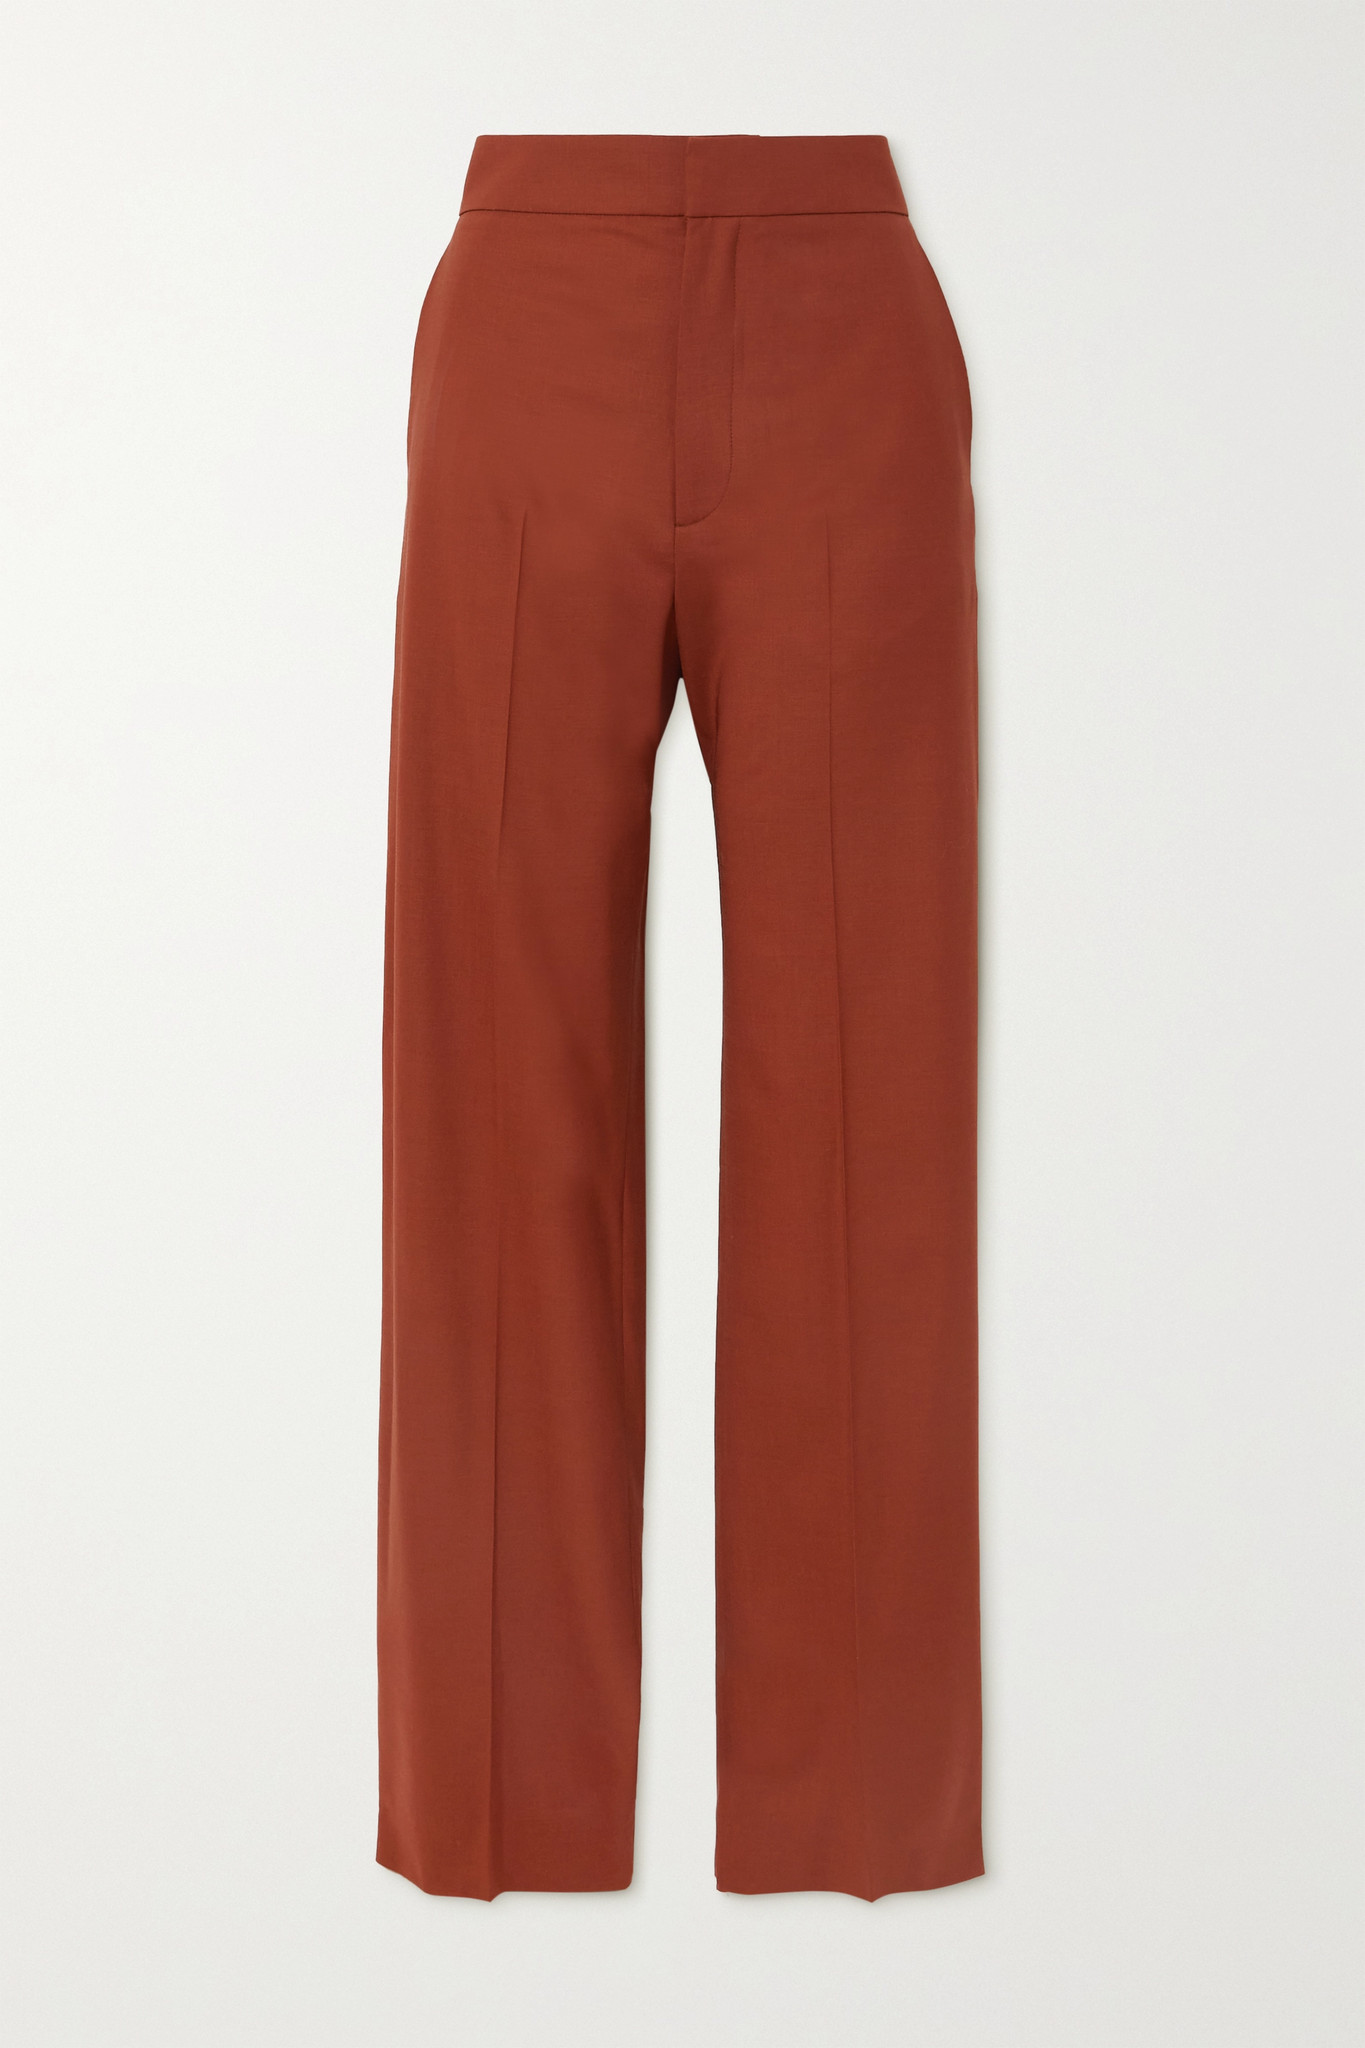 GAUCHERE - Seline 褶裥羊毛混纺阔腿裤 - 红色 - FR38